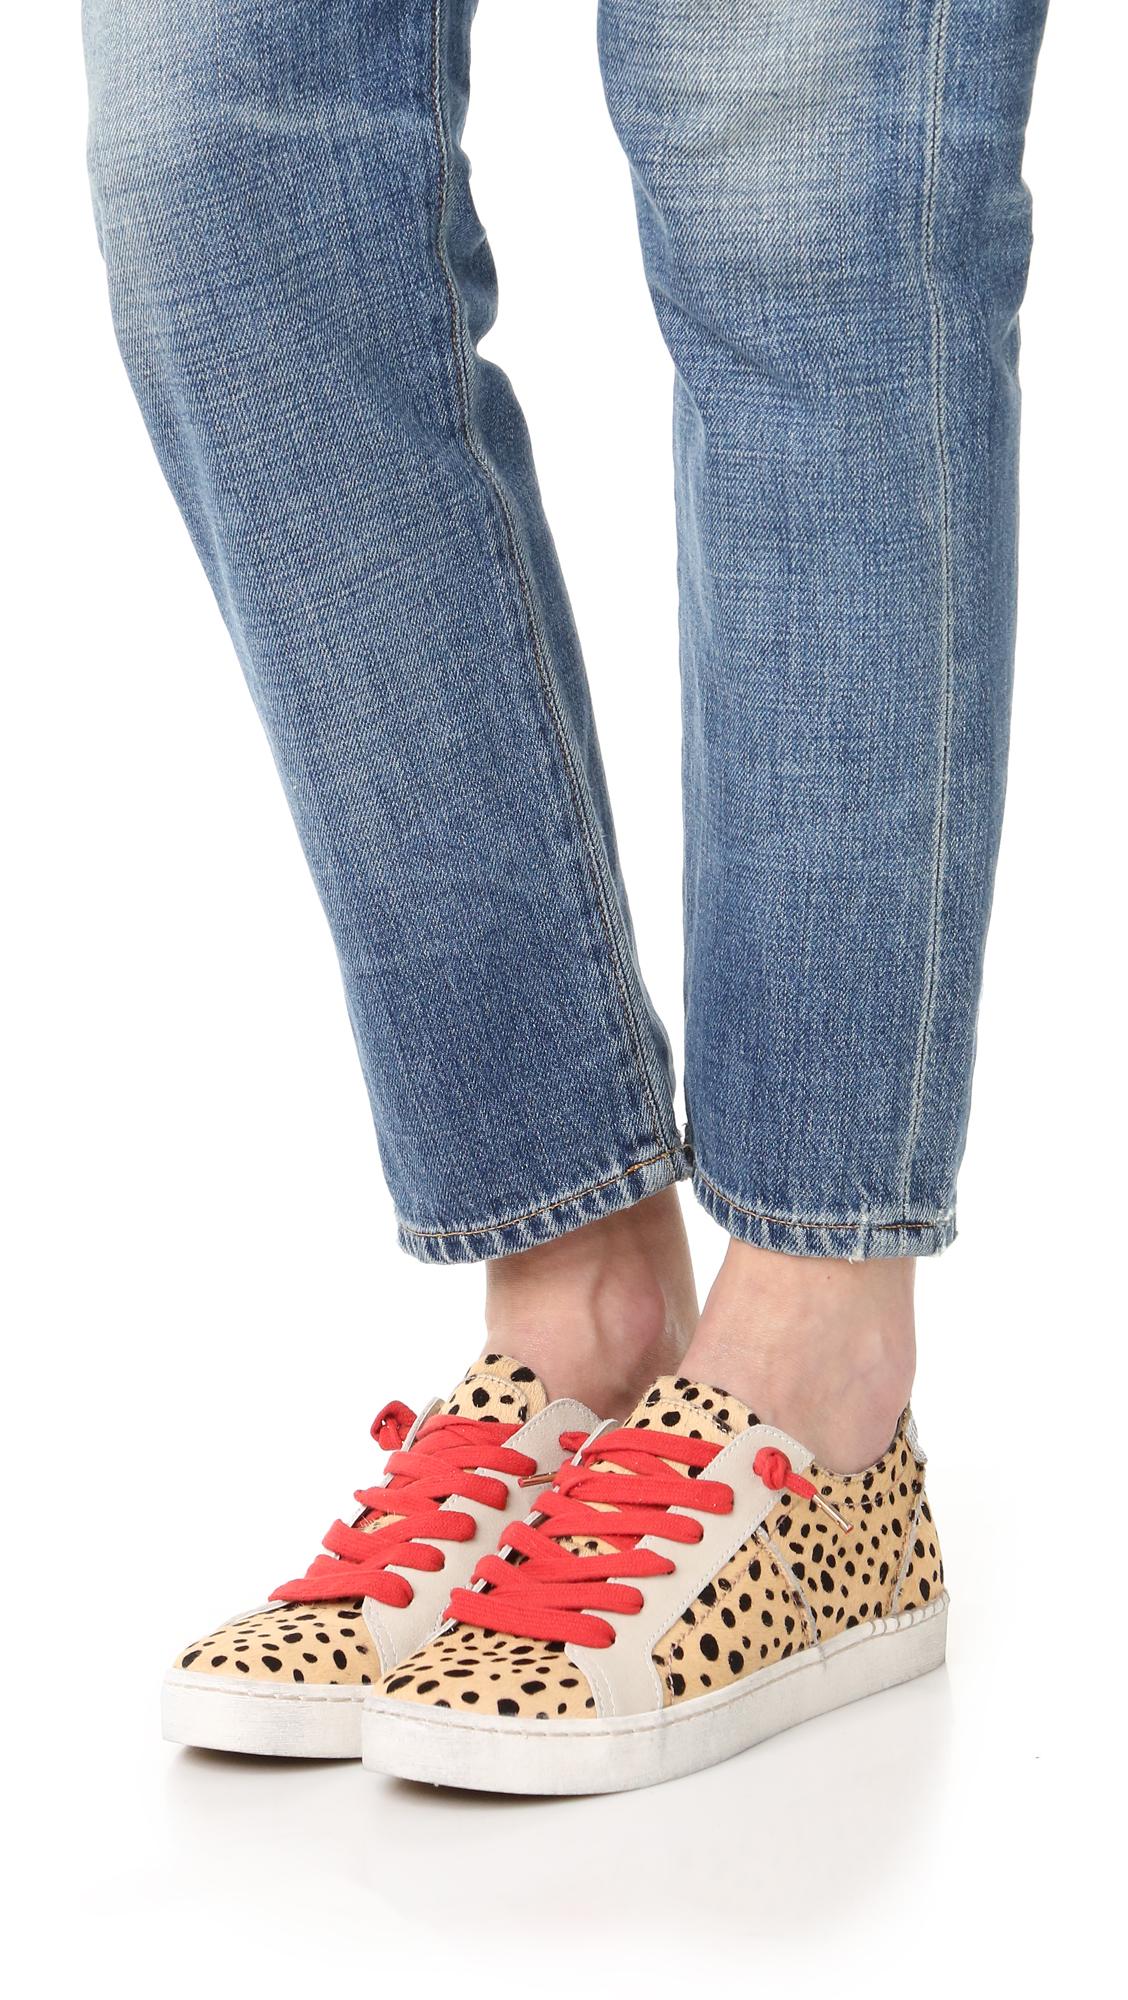 6b3f5bef0db0 Dolce Vita Zalen Haircalf Sneakers | SHOPBOP